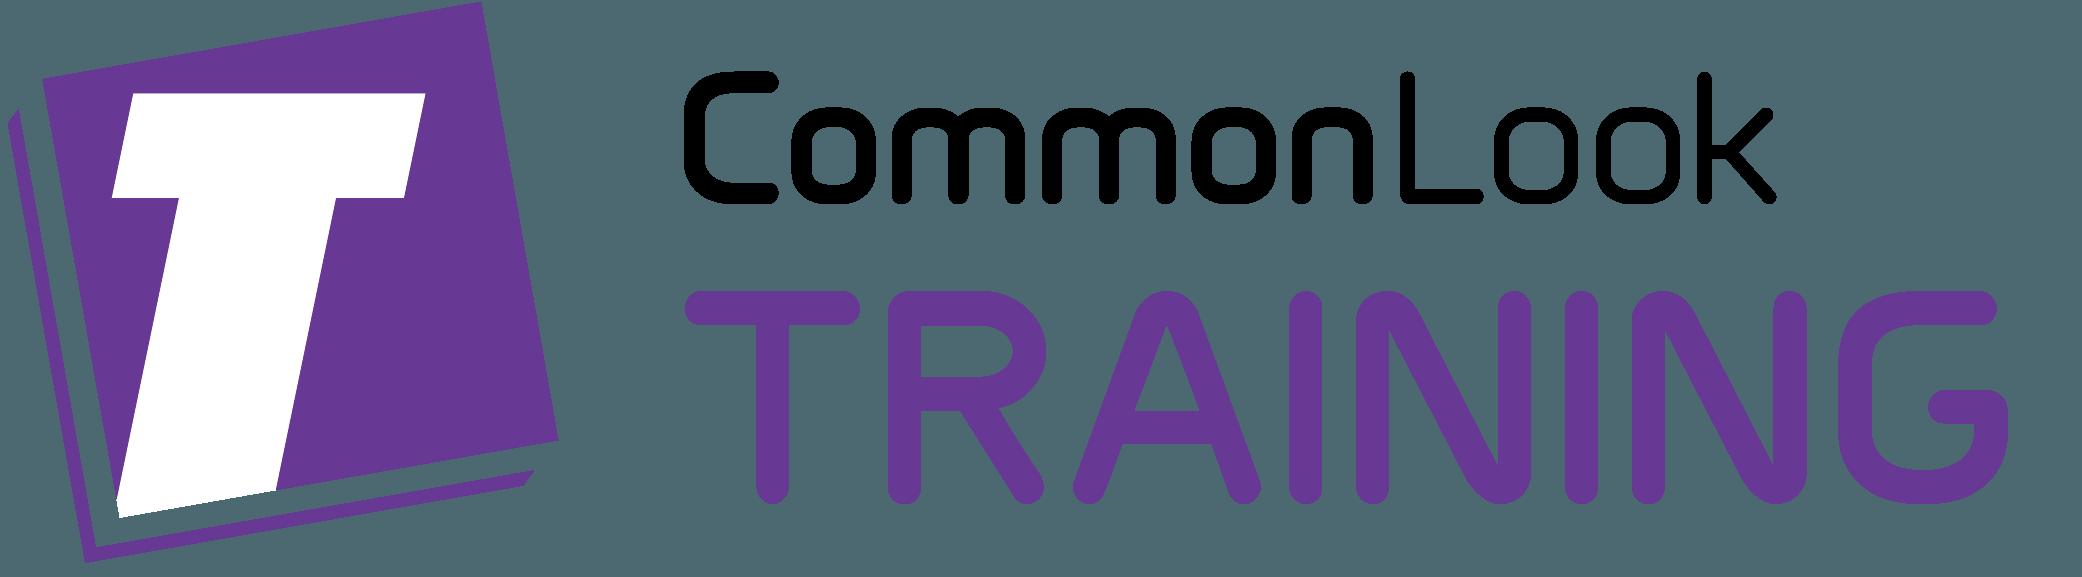 CommonLook Training Logo